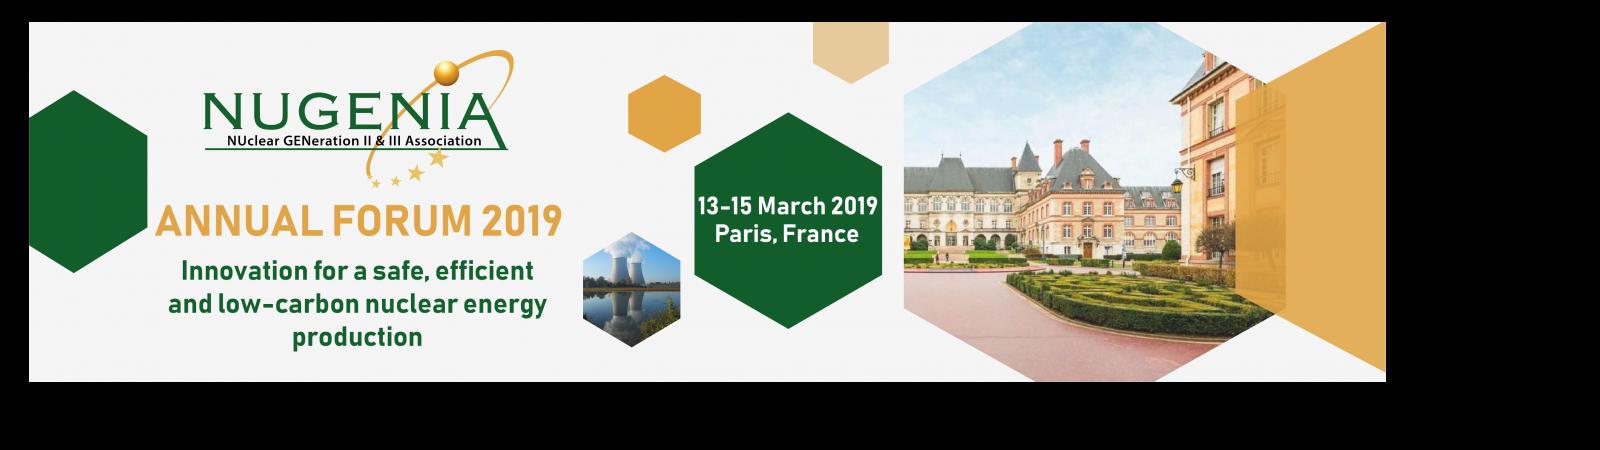 NUGENIA-Forum-2019